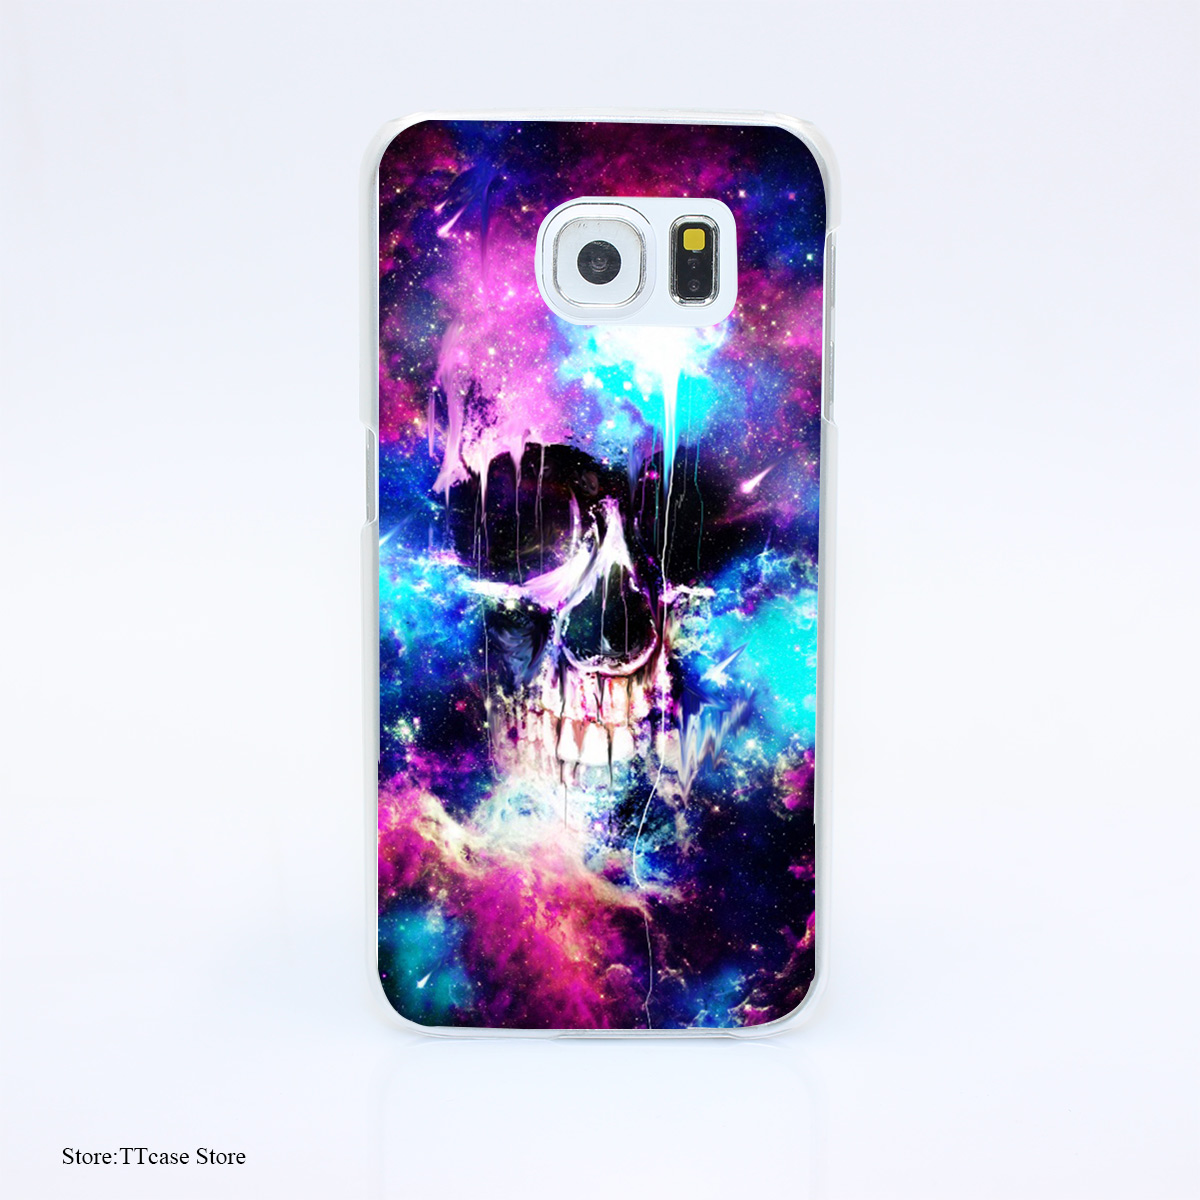 3100G Space Skull Ttj Print Hard Transparent Case Cover for Galaxy S3 S4 S5 & Mini S6 S7 & edge